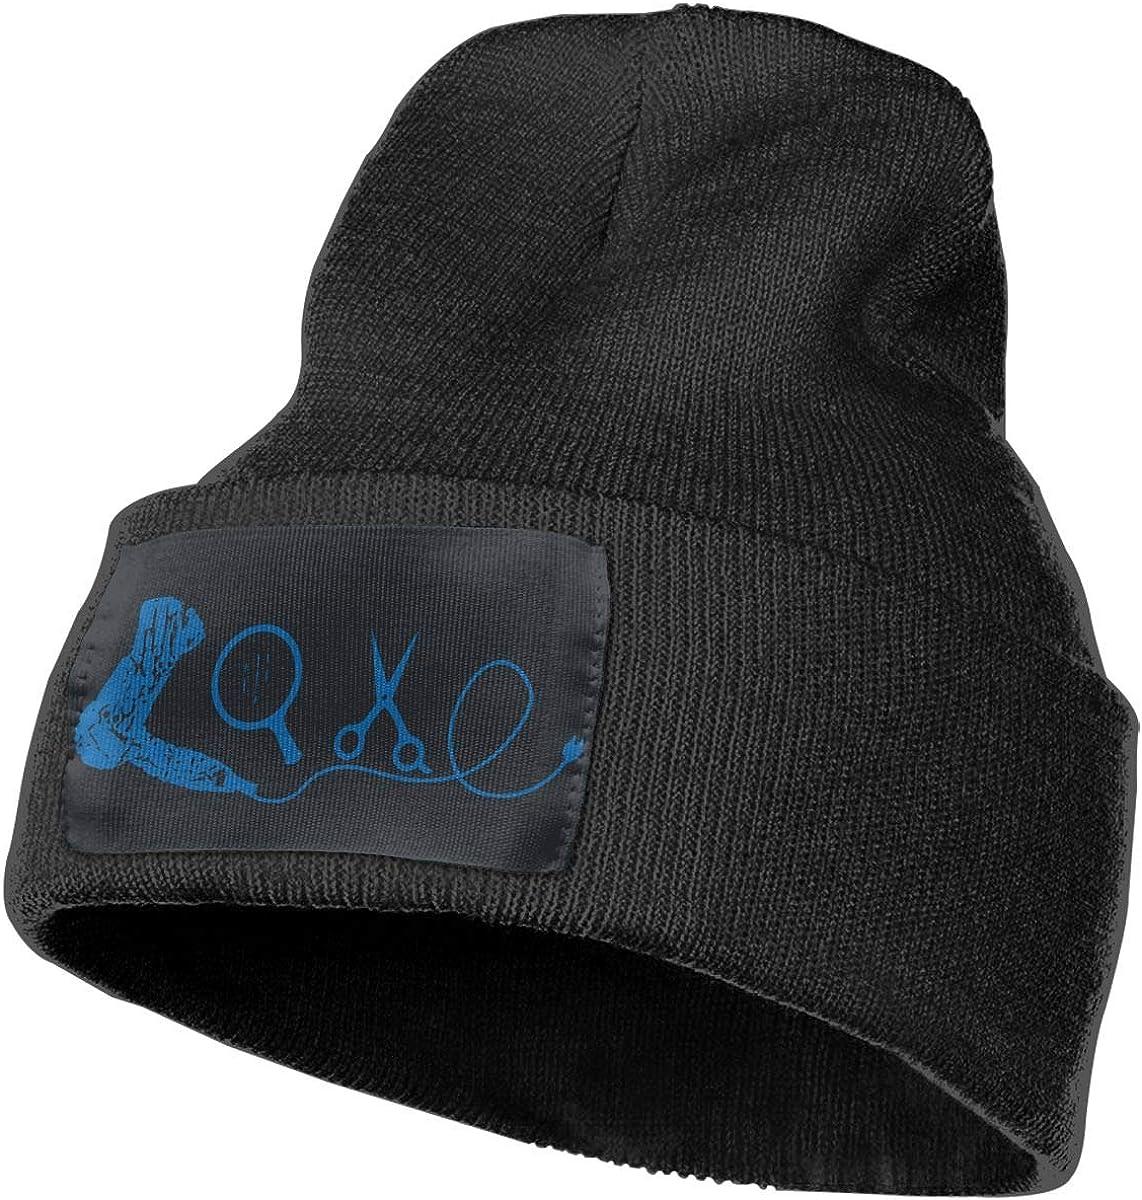 Love Hairdresser-3 Cute Skull Cap Unisex 100/% Acrylic Knit Hat Cap